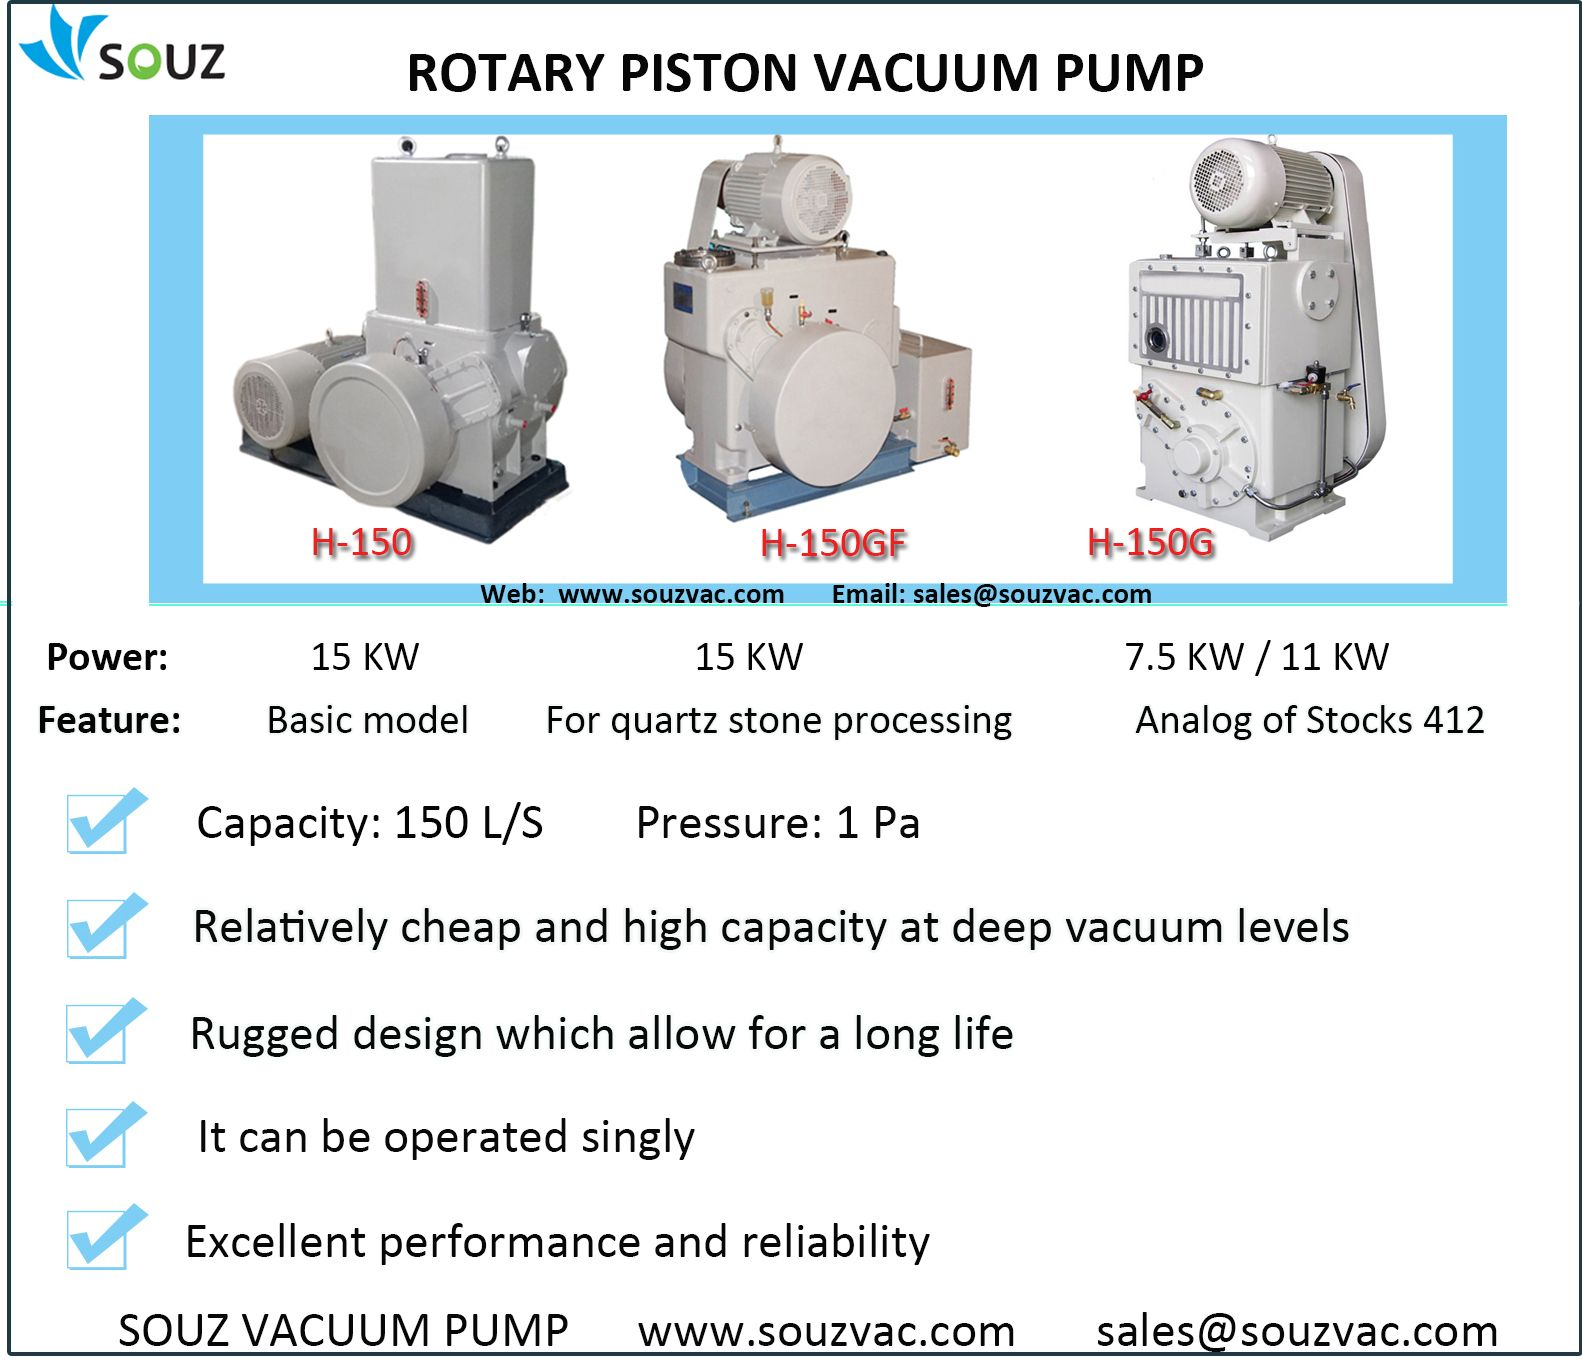 Rotary Piston Vacuum Pump In 2020 Vacuum Pump Vacuums Rotary